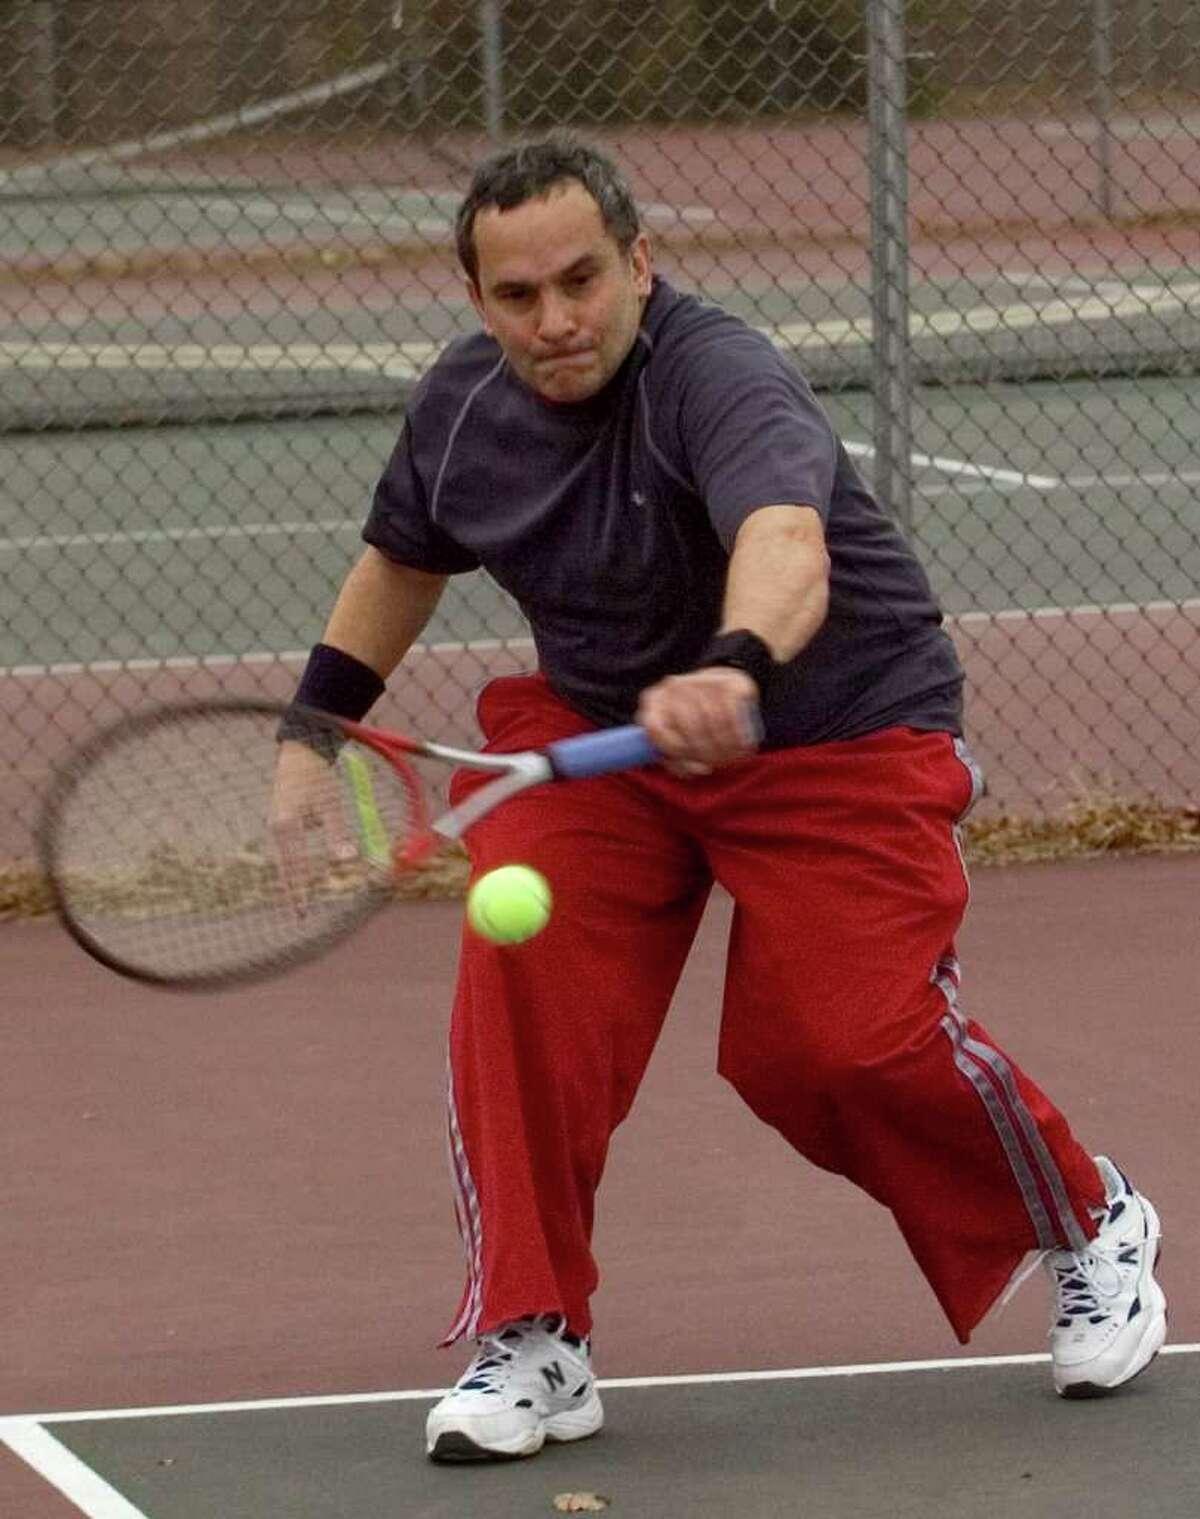 Thomas Perri, of Danbury, returns the tennis ball. Photographed on Thursday, Dec. 22, 2011.